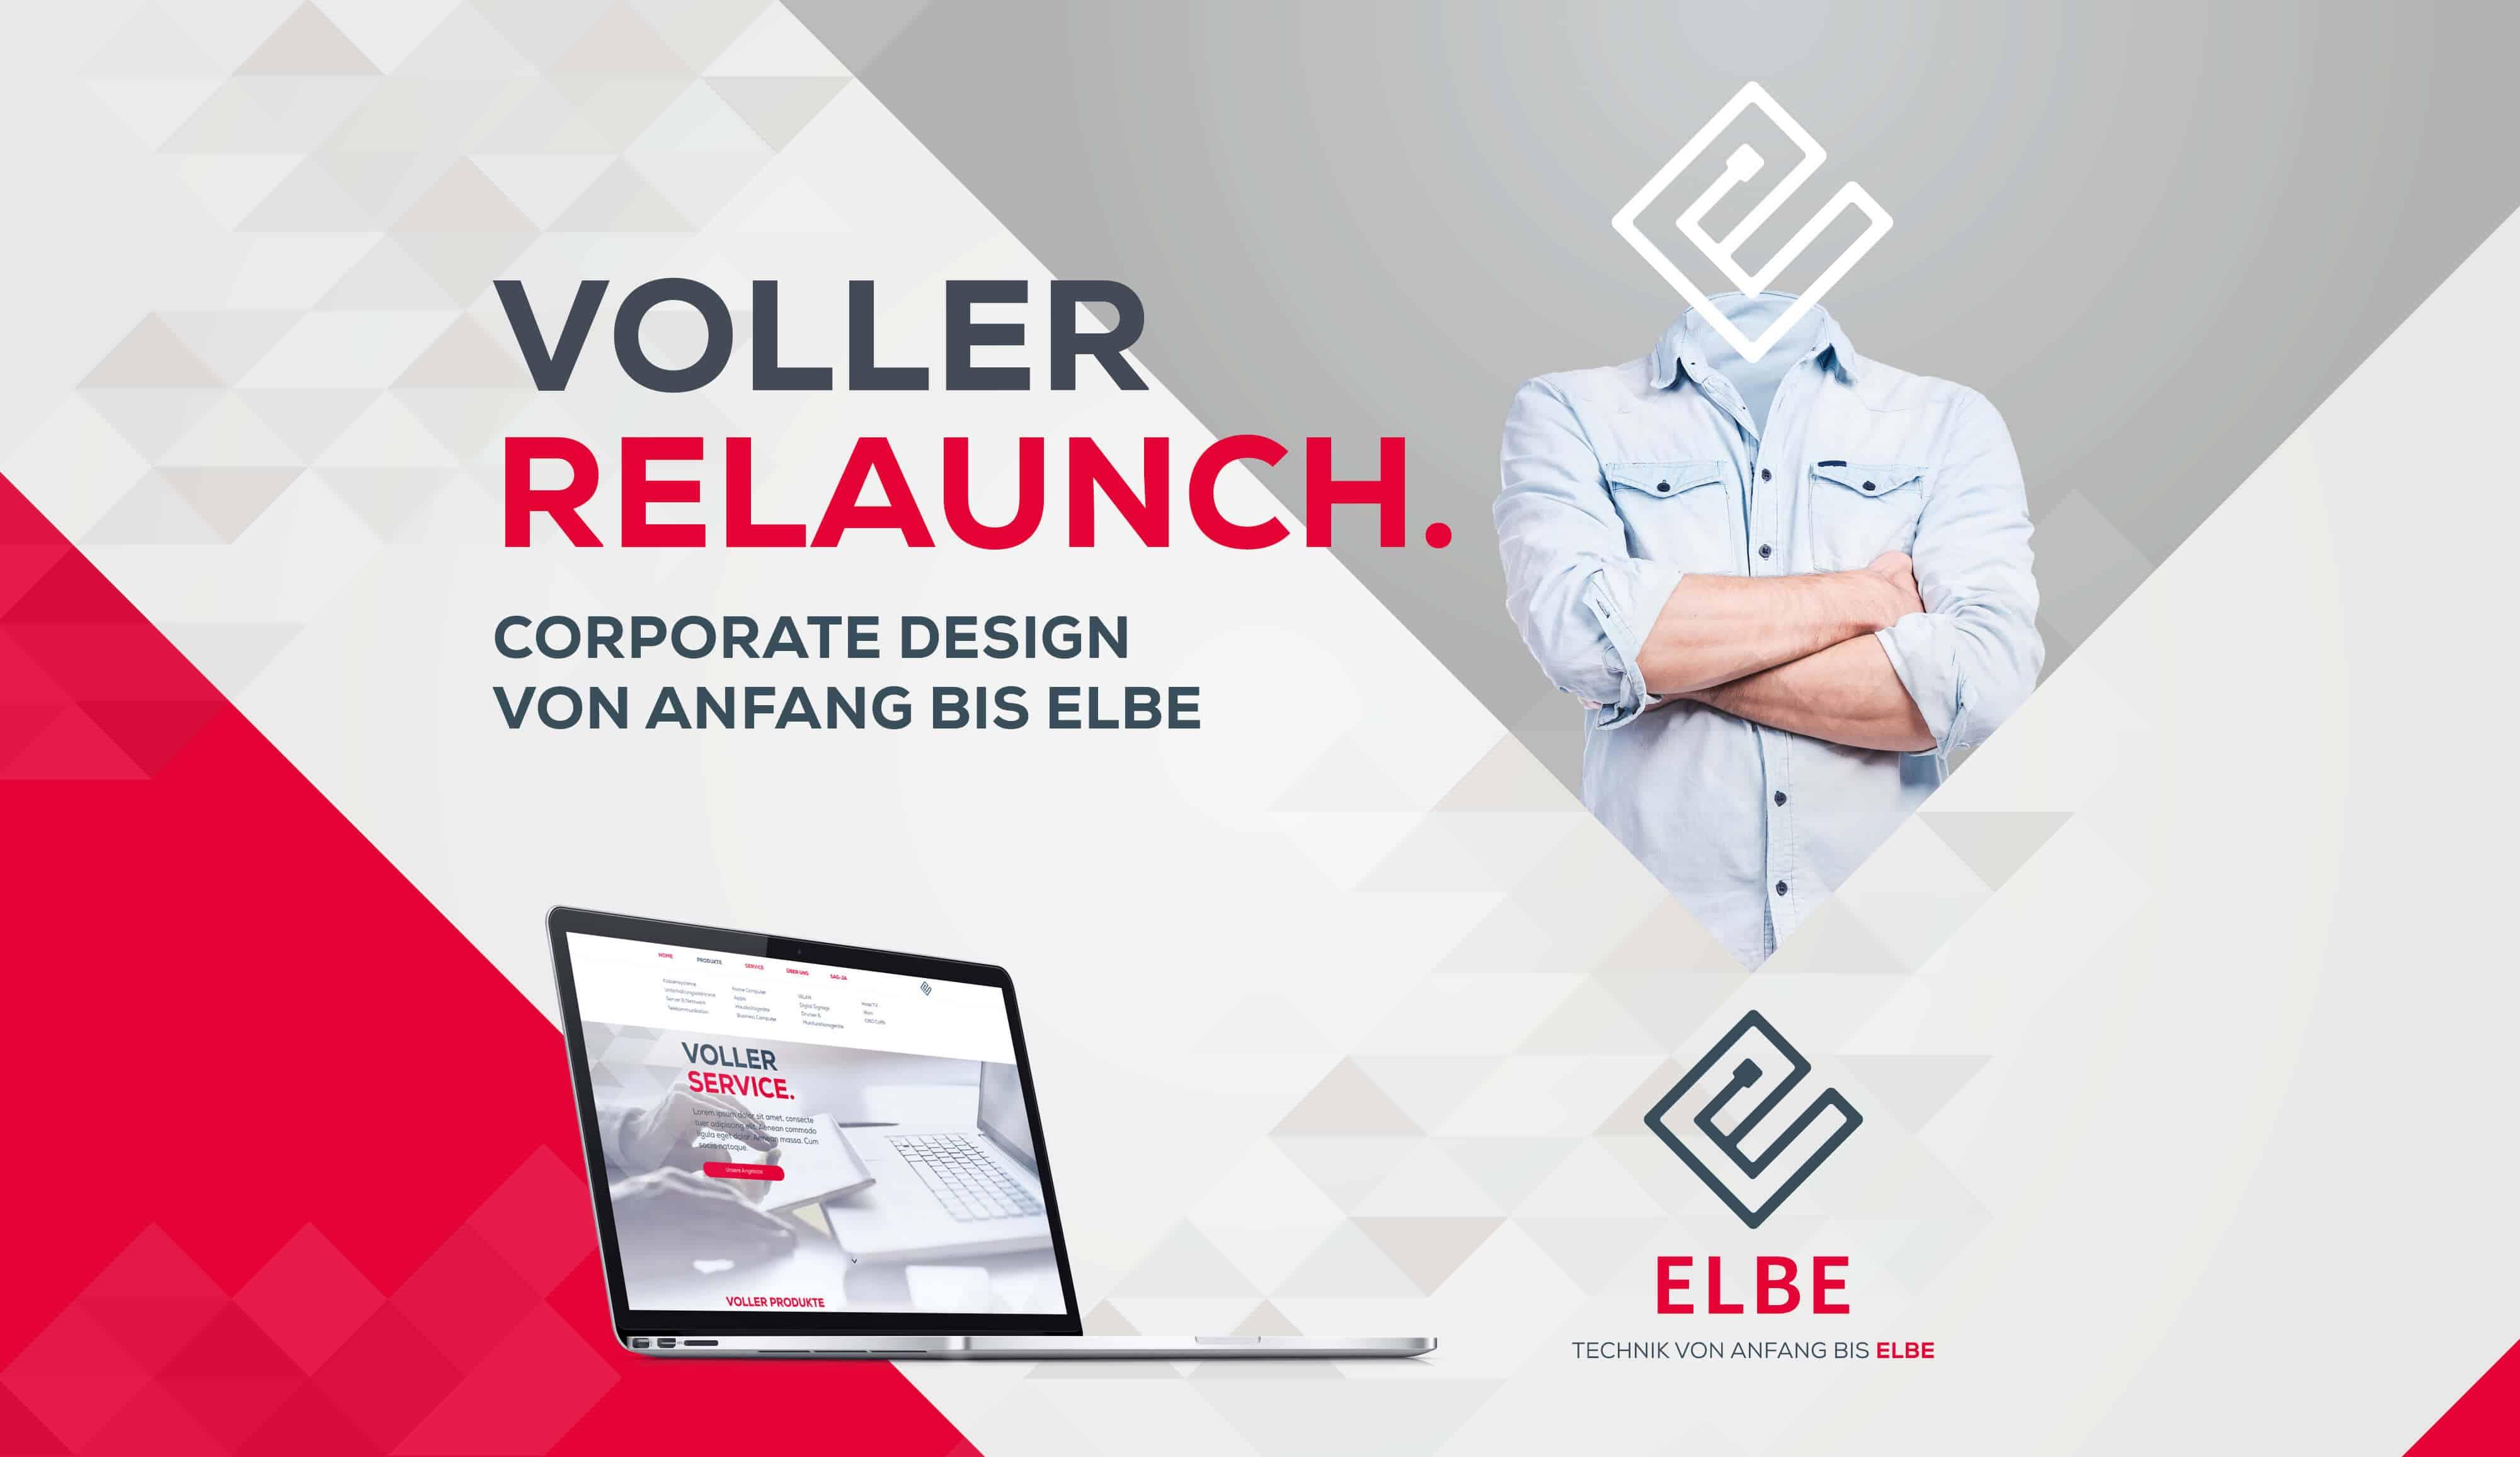 ELBE_Aufbereitung_01